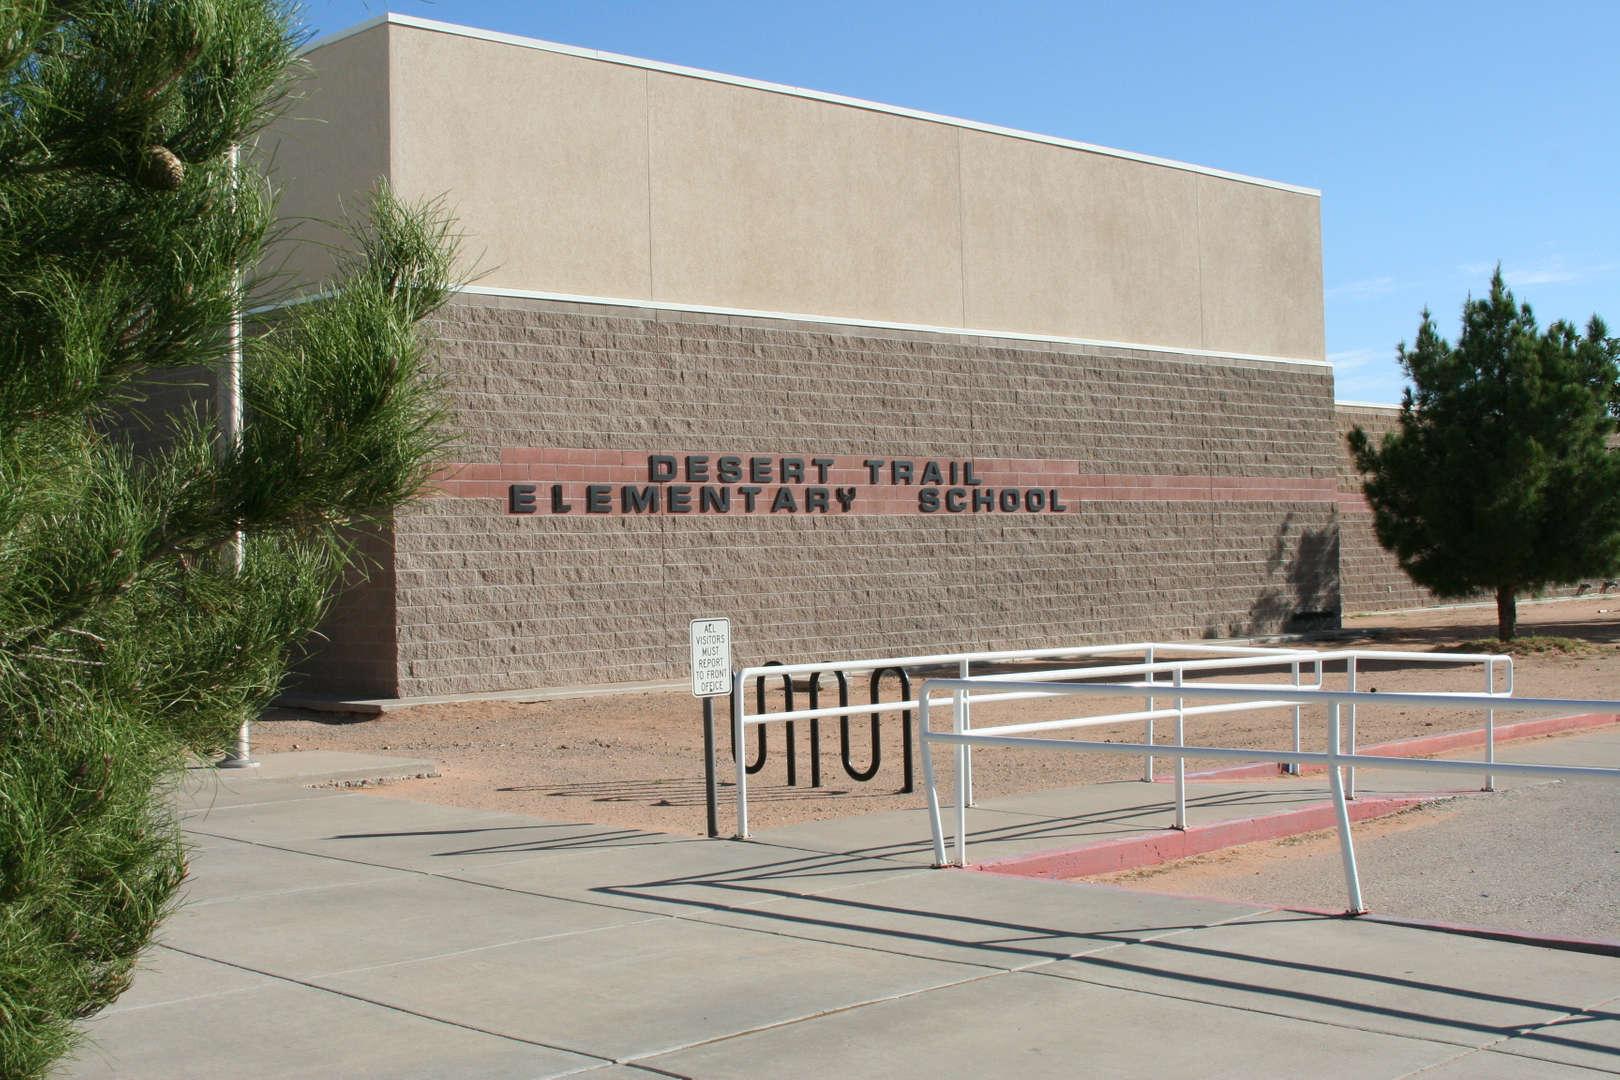 Desert Trail Elementary school front fascade img